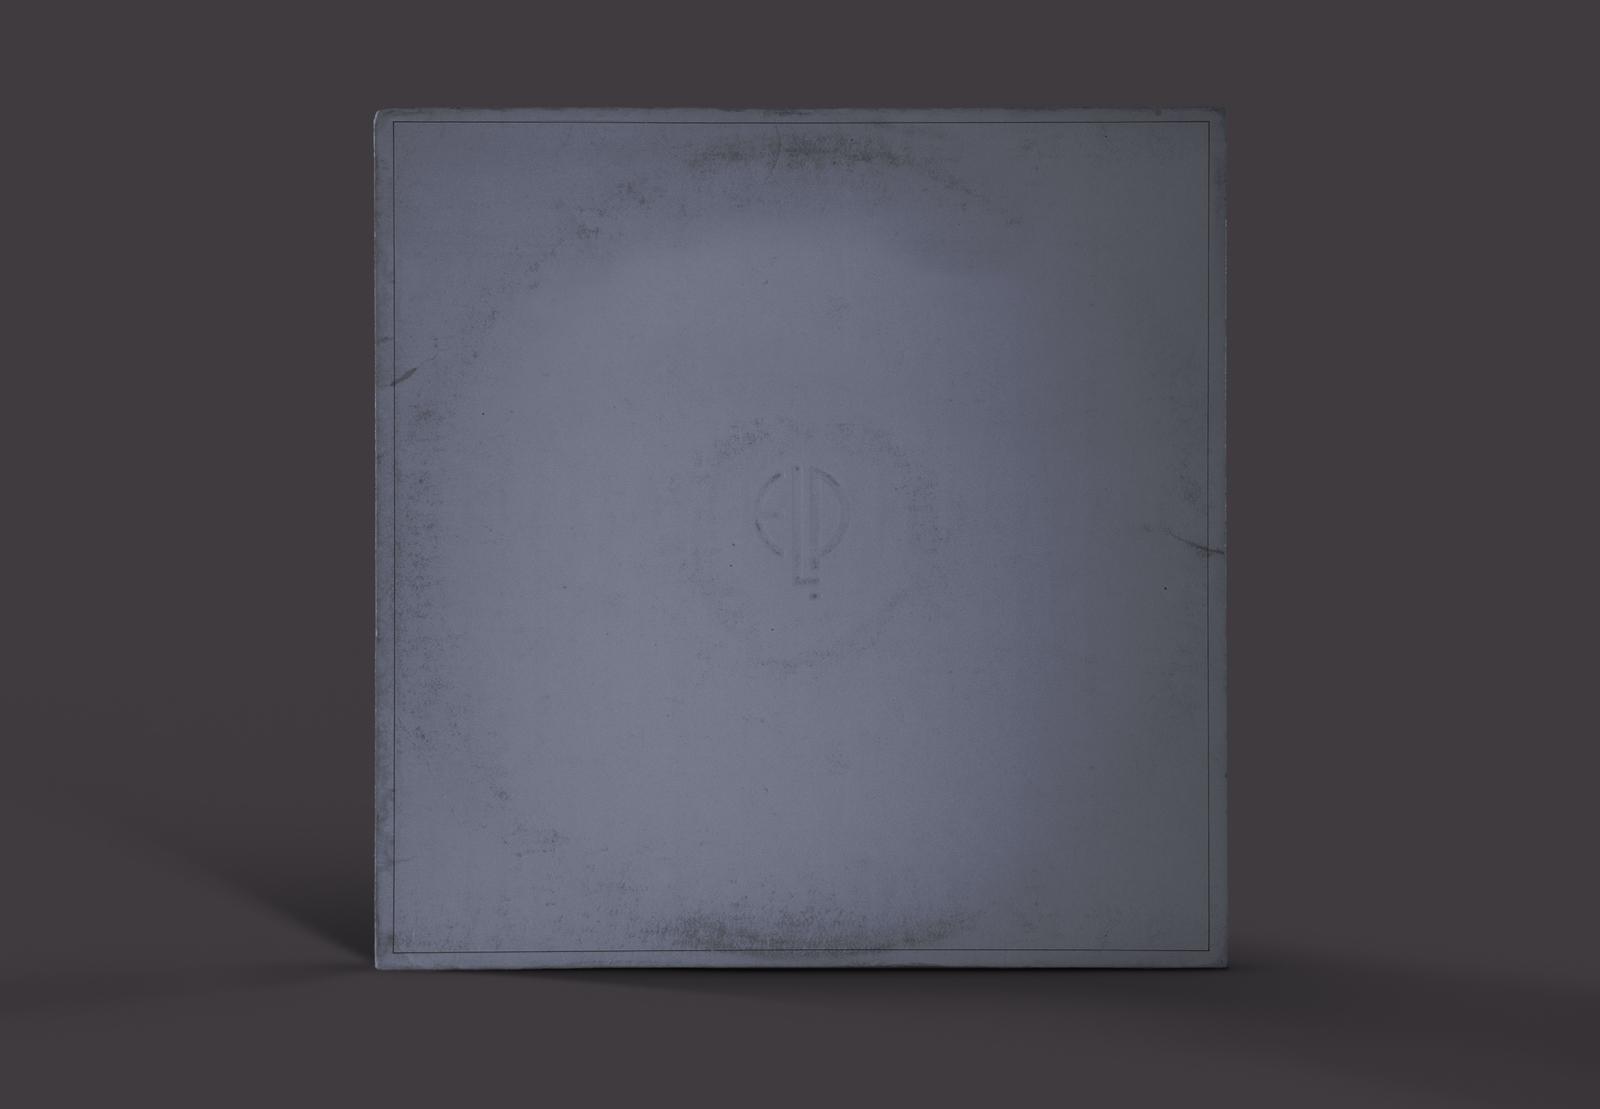 The Vinyl Record Mockup Templates Get an Upgrade! - Go Media ...